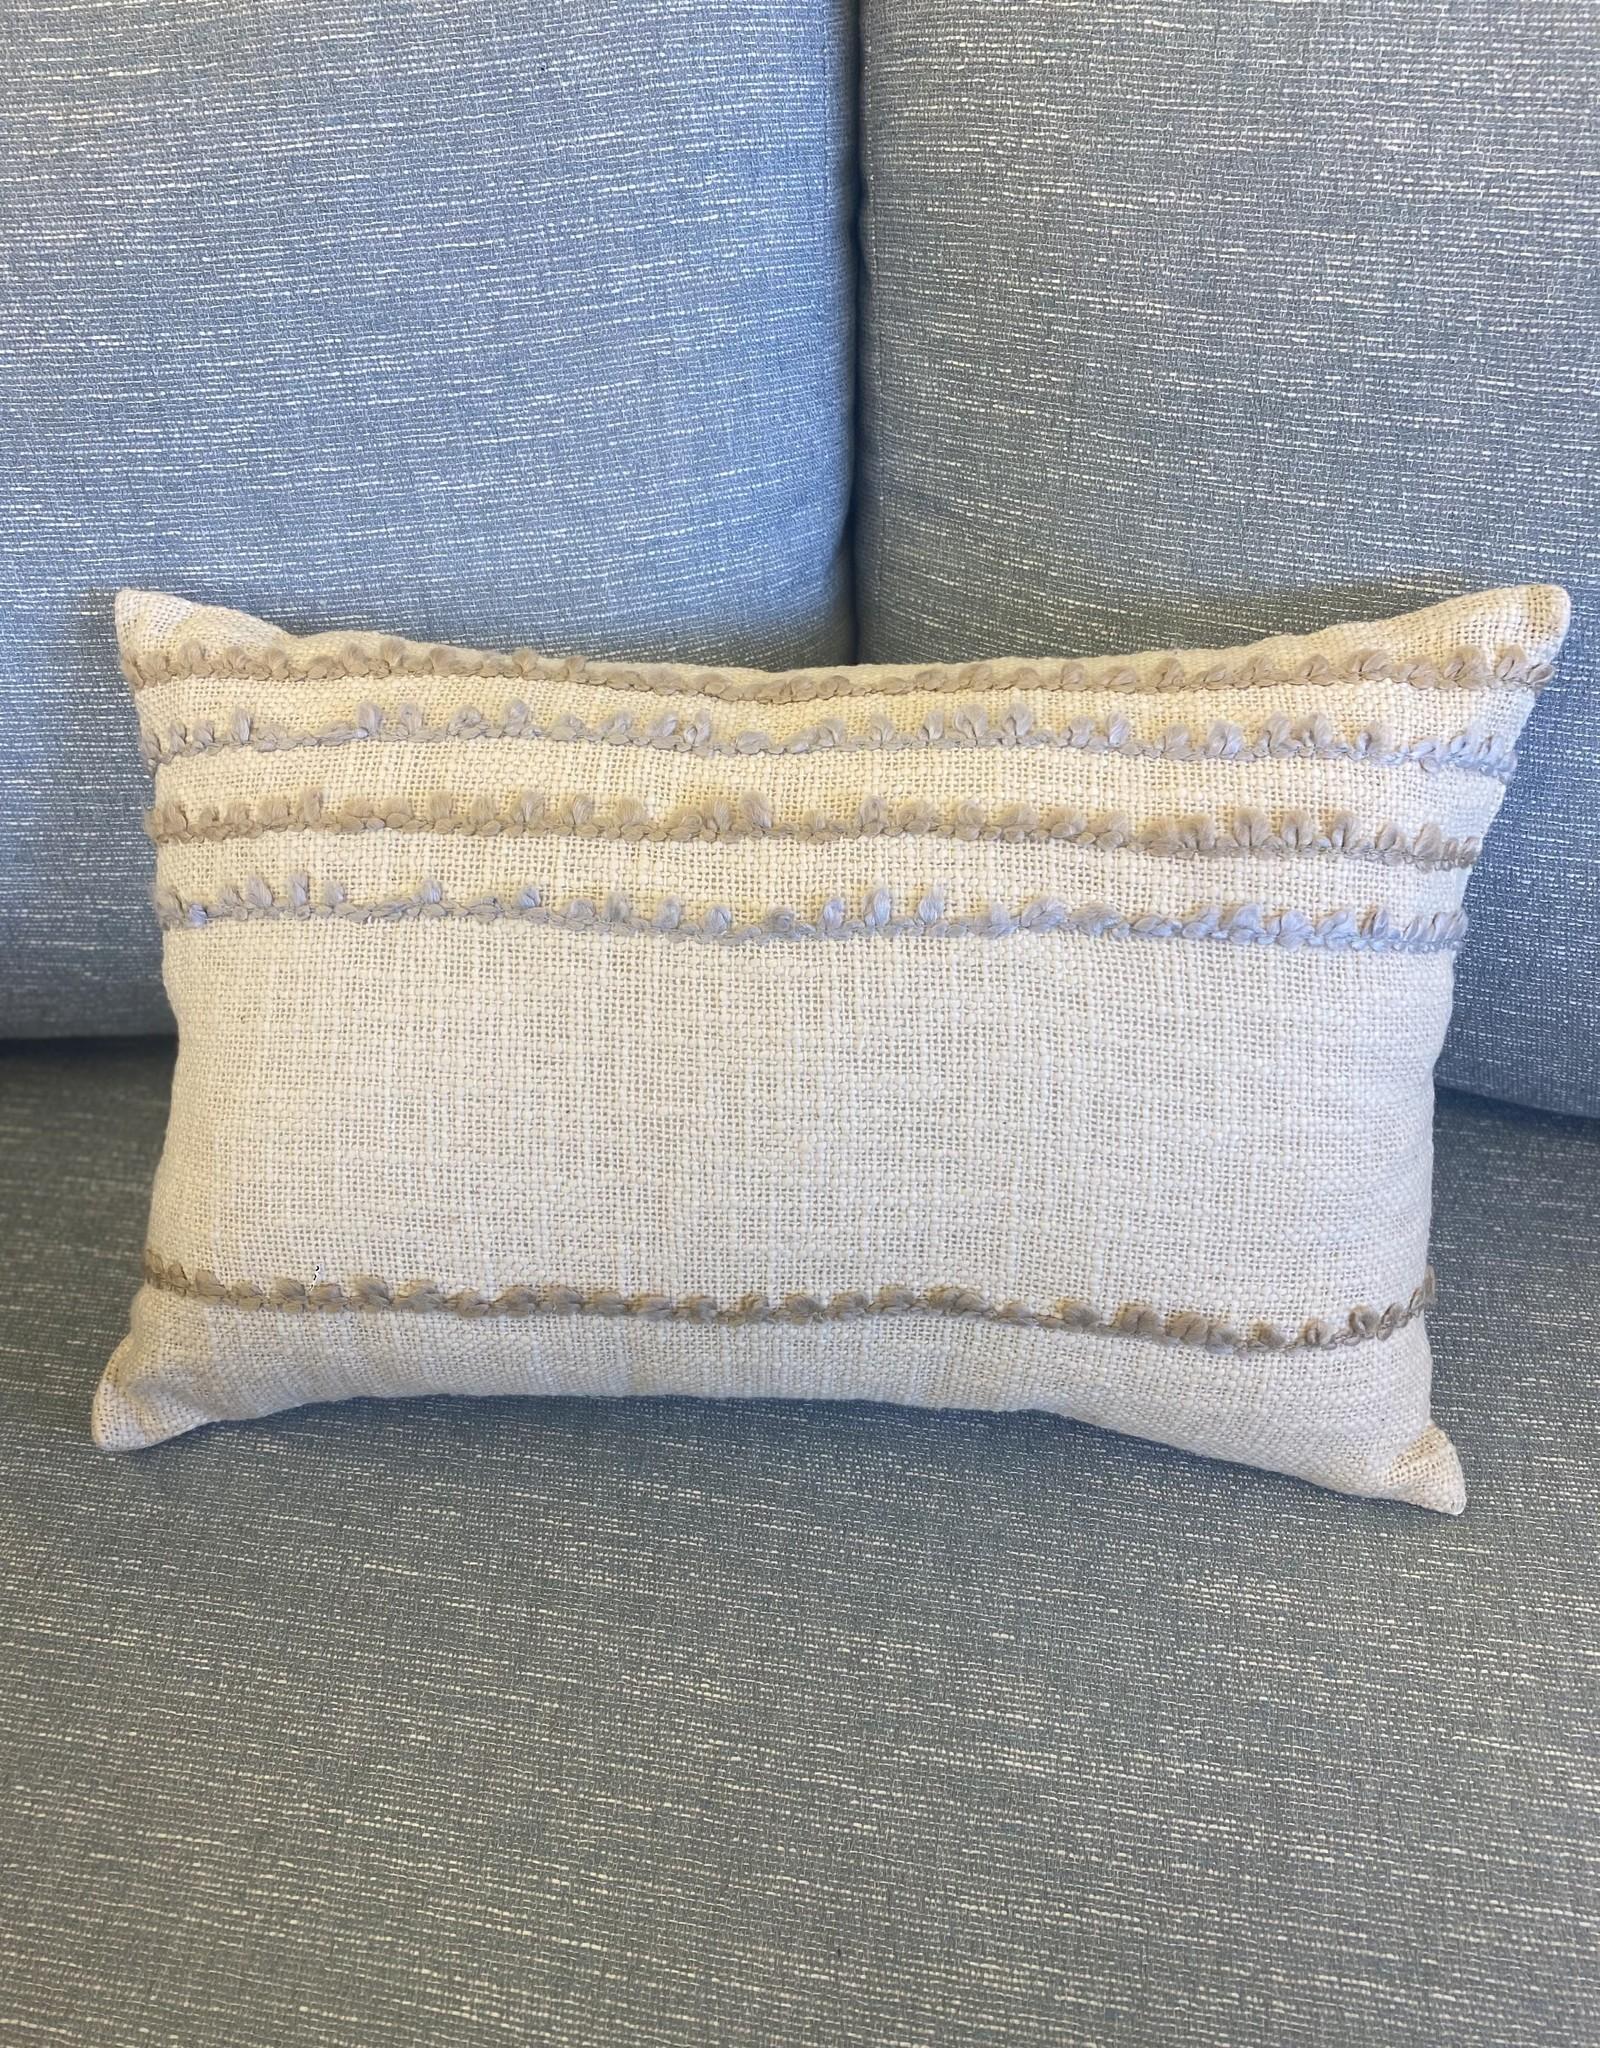 Cushions PC Lola 14 x 20